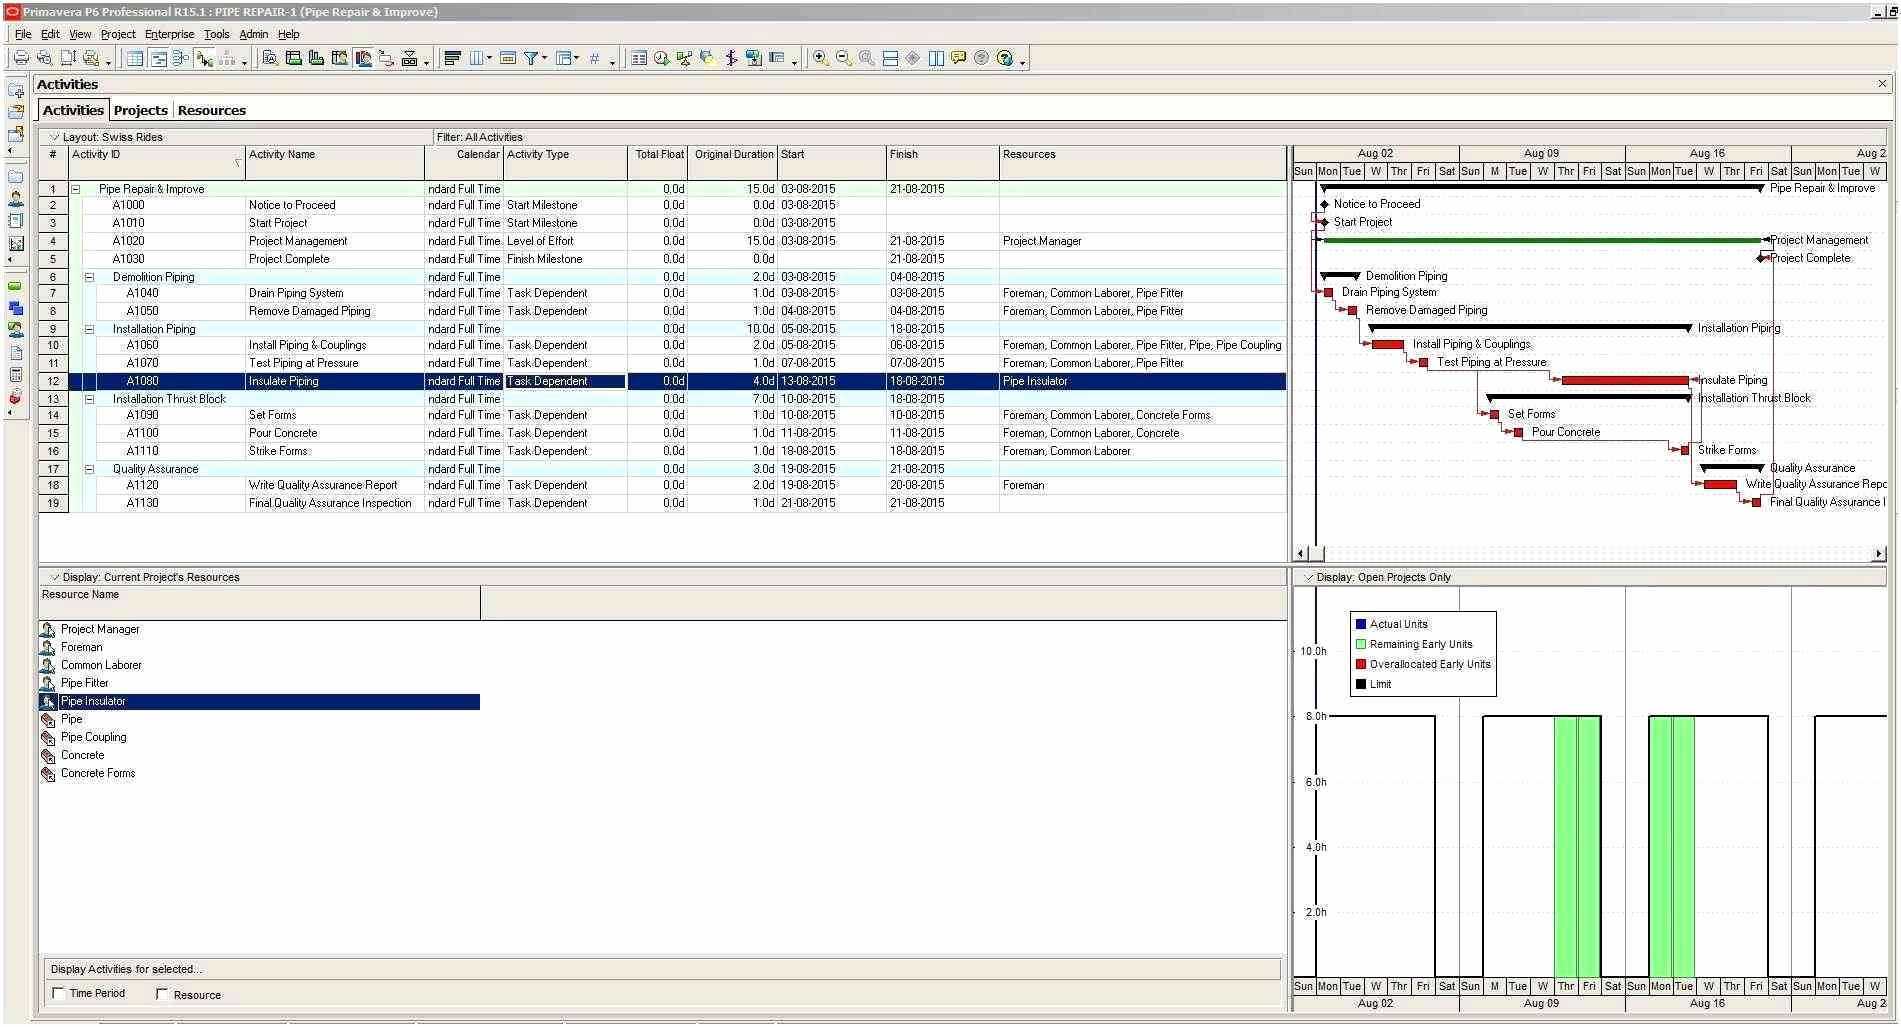 Monte Carlo Simulation Spreadsheet Regarding Monte Carlo Simulation Excel Template Lovely Dcf Excel Template New